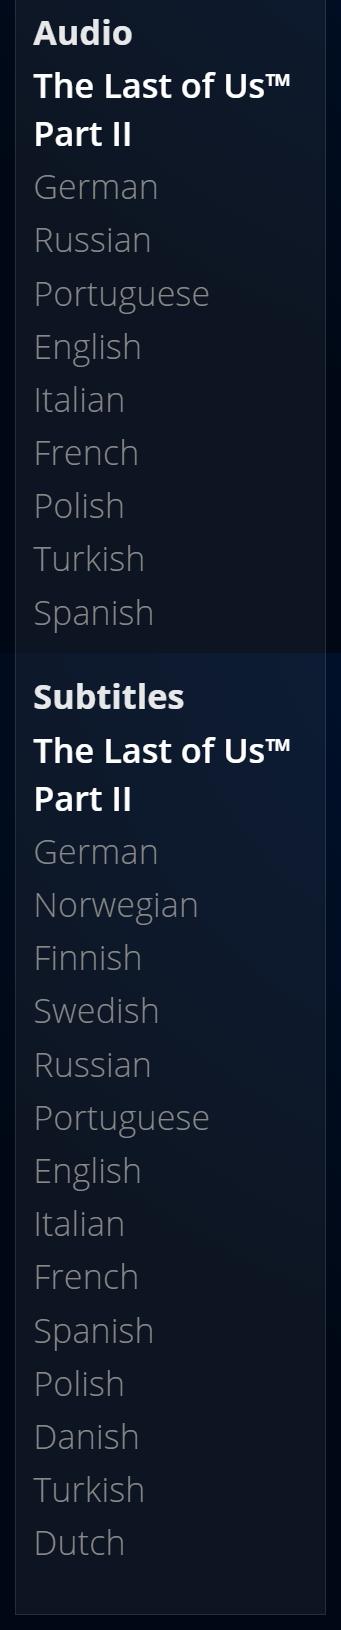 4jd4dik - 【悲報】The Last of Us Part2、なぜか日本語版だけ容量が20ギガバイト少ない…